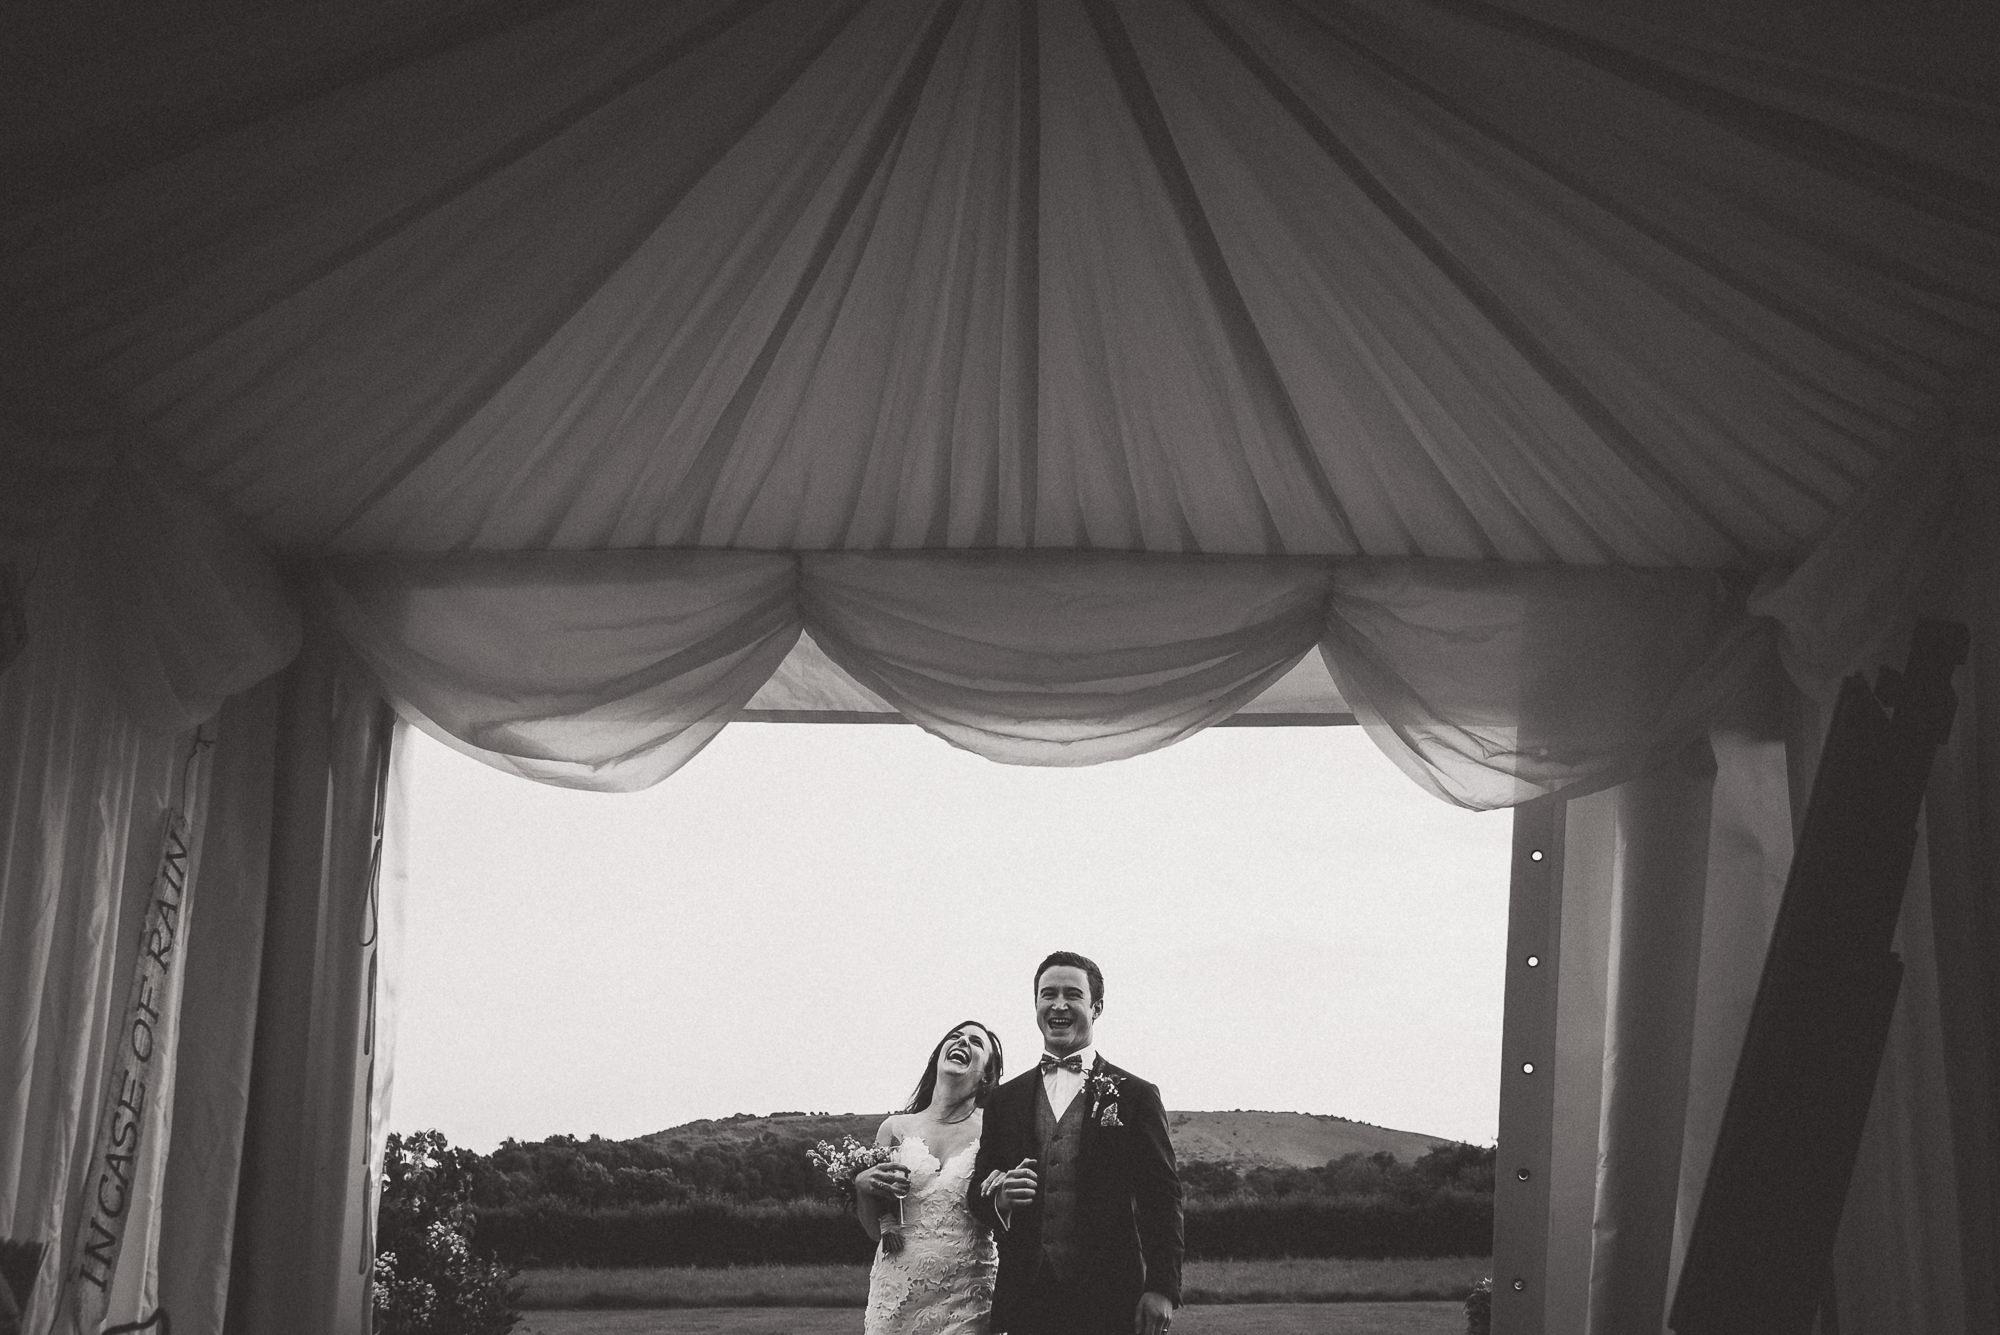 Veils & Bales Wedding Photography | Charlie & Steve SCSS 166